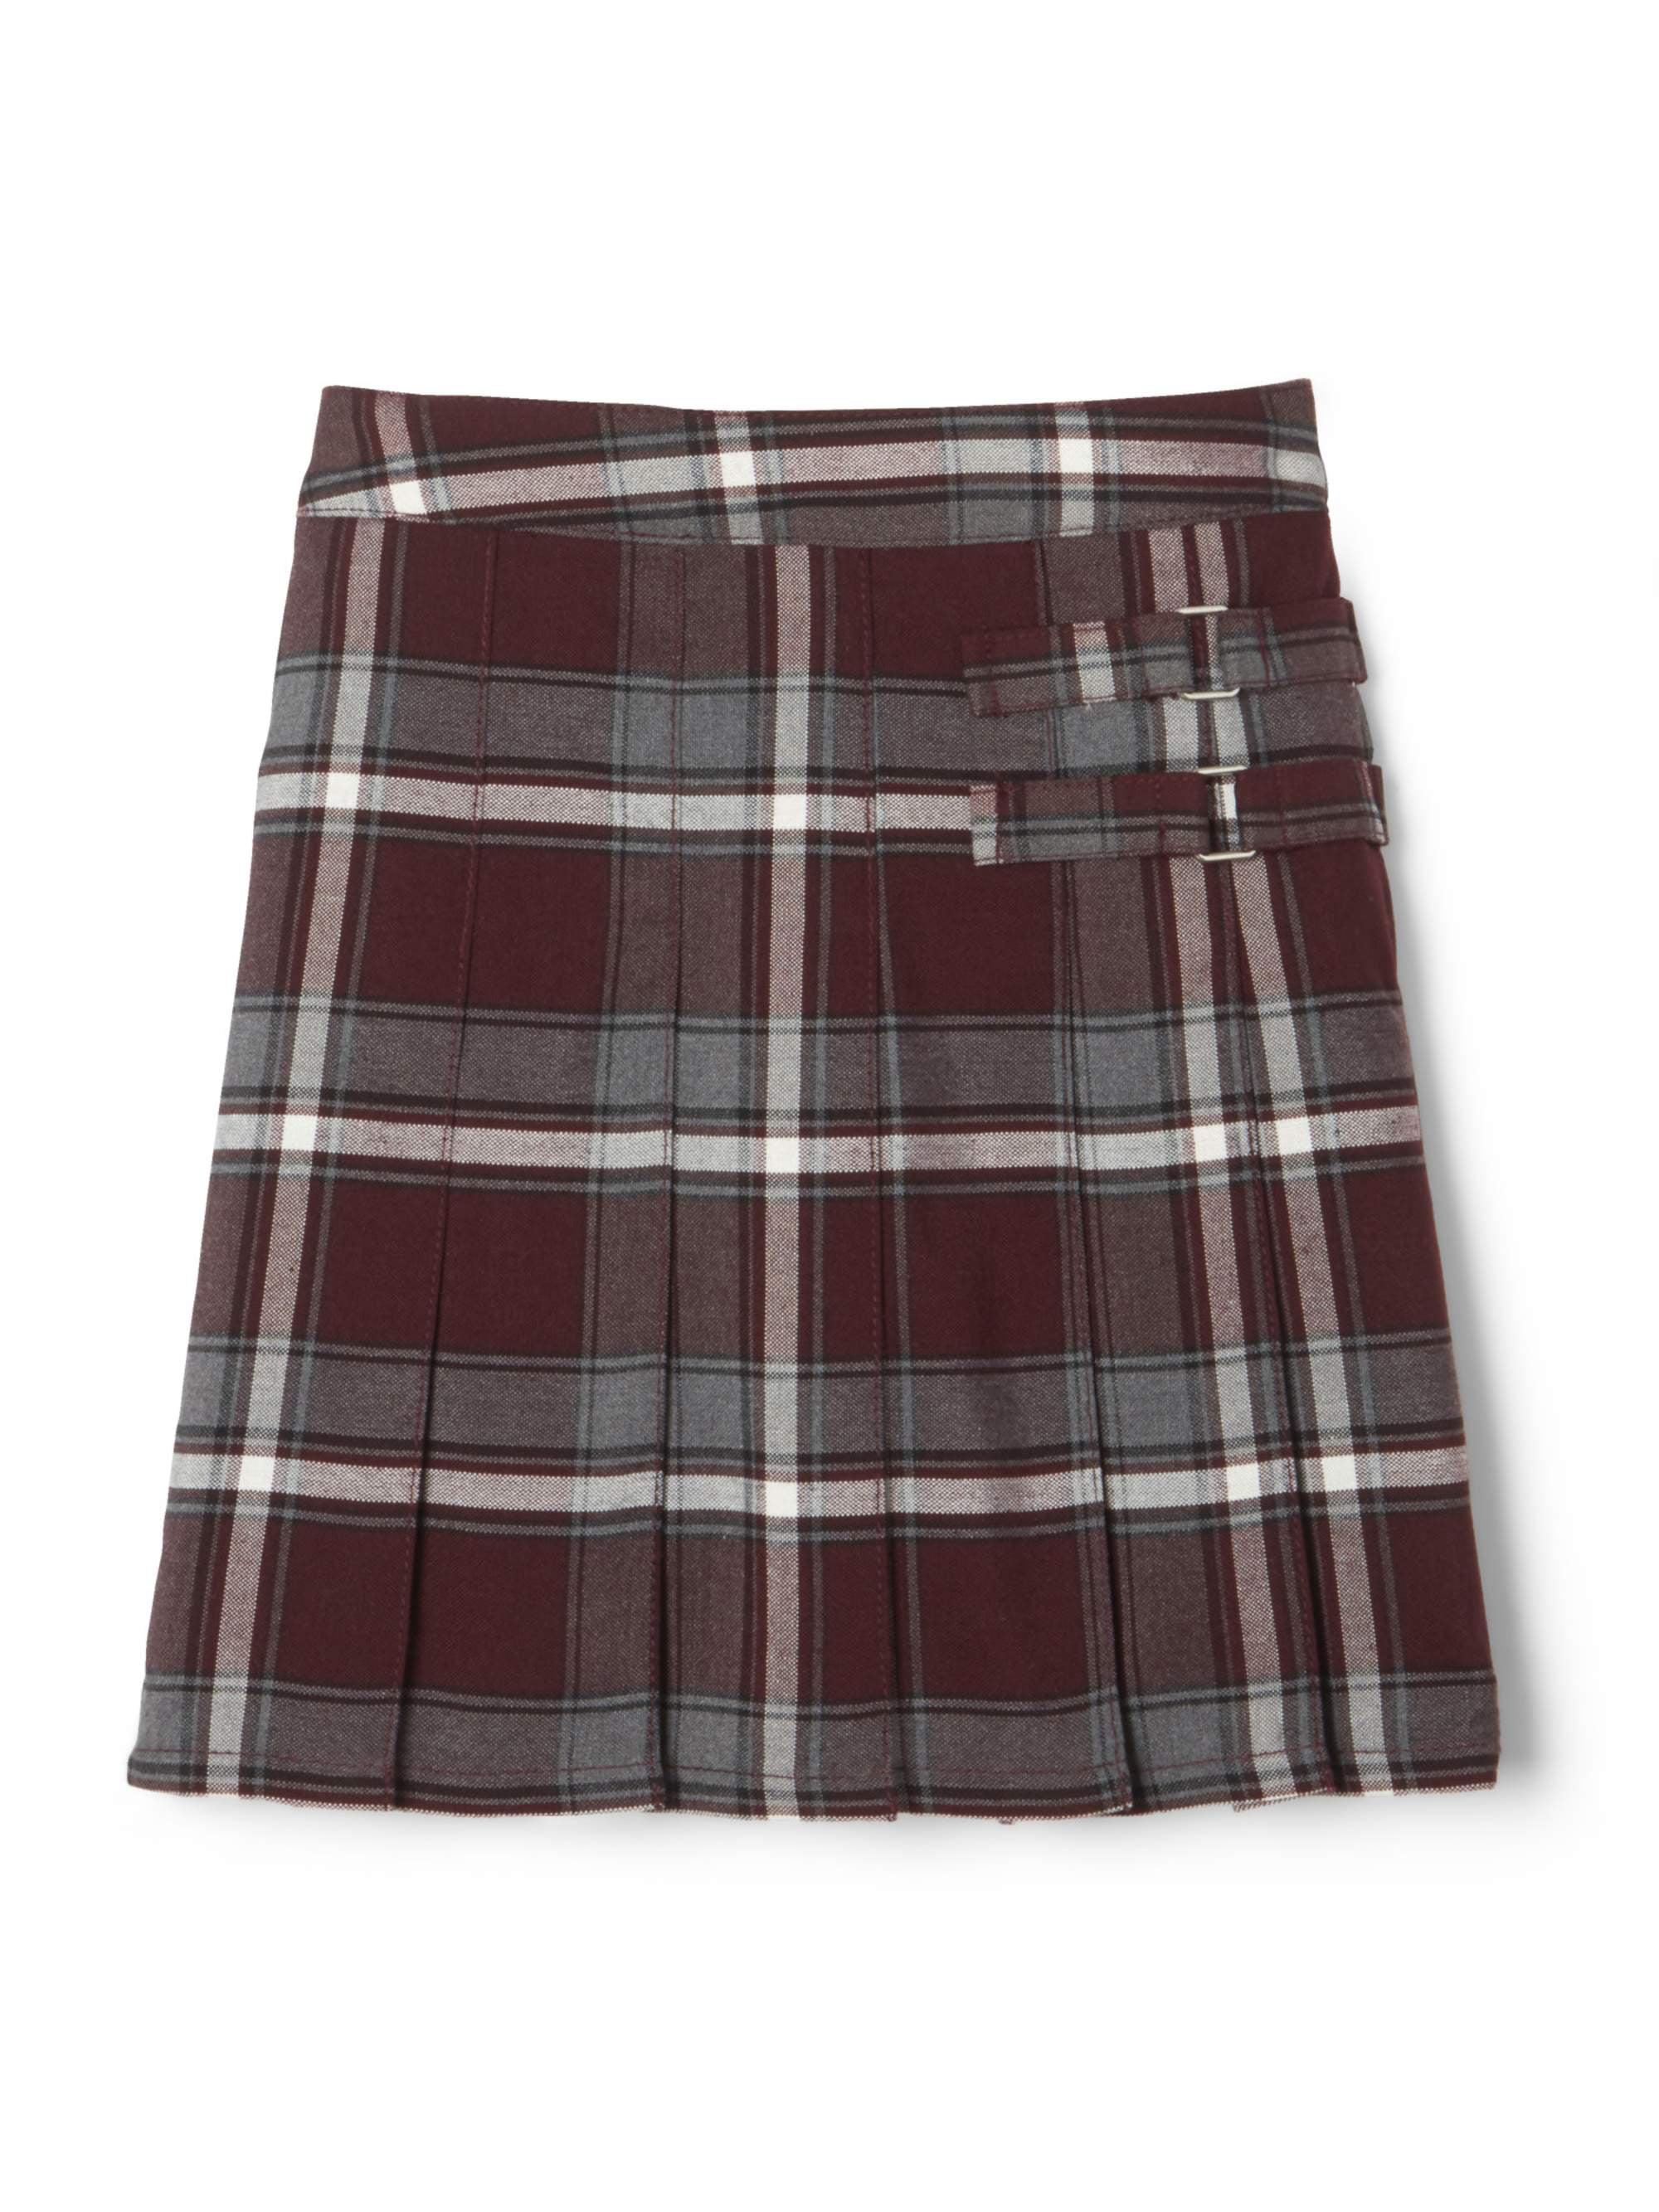 French Toast School Uniform Girls Regular /& Plus Sizes Pleat Plaid Scooter Skirt